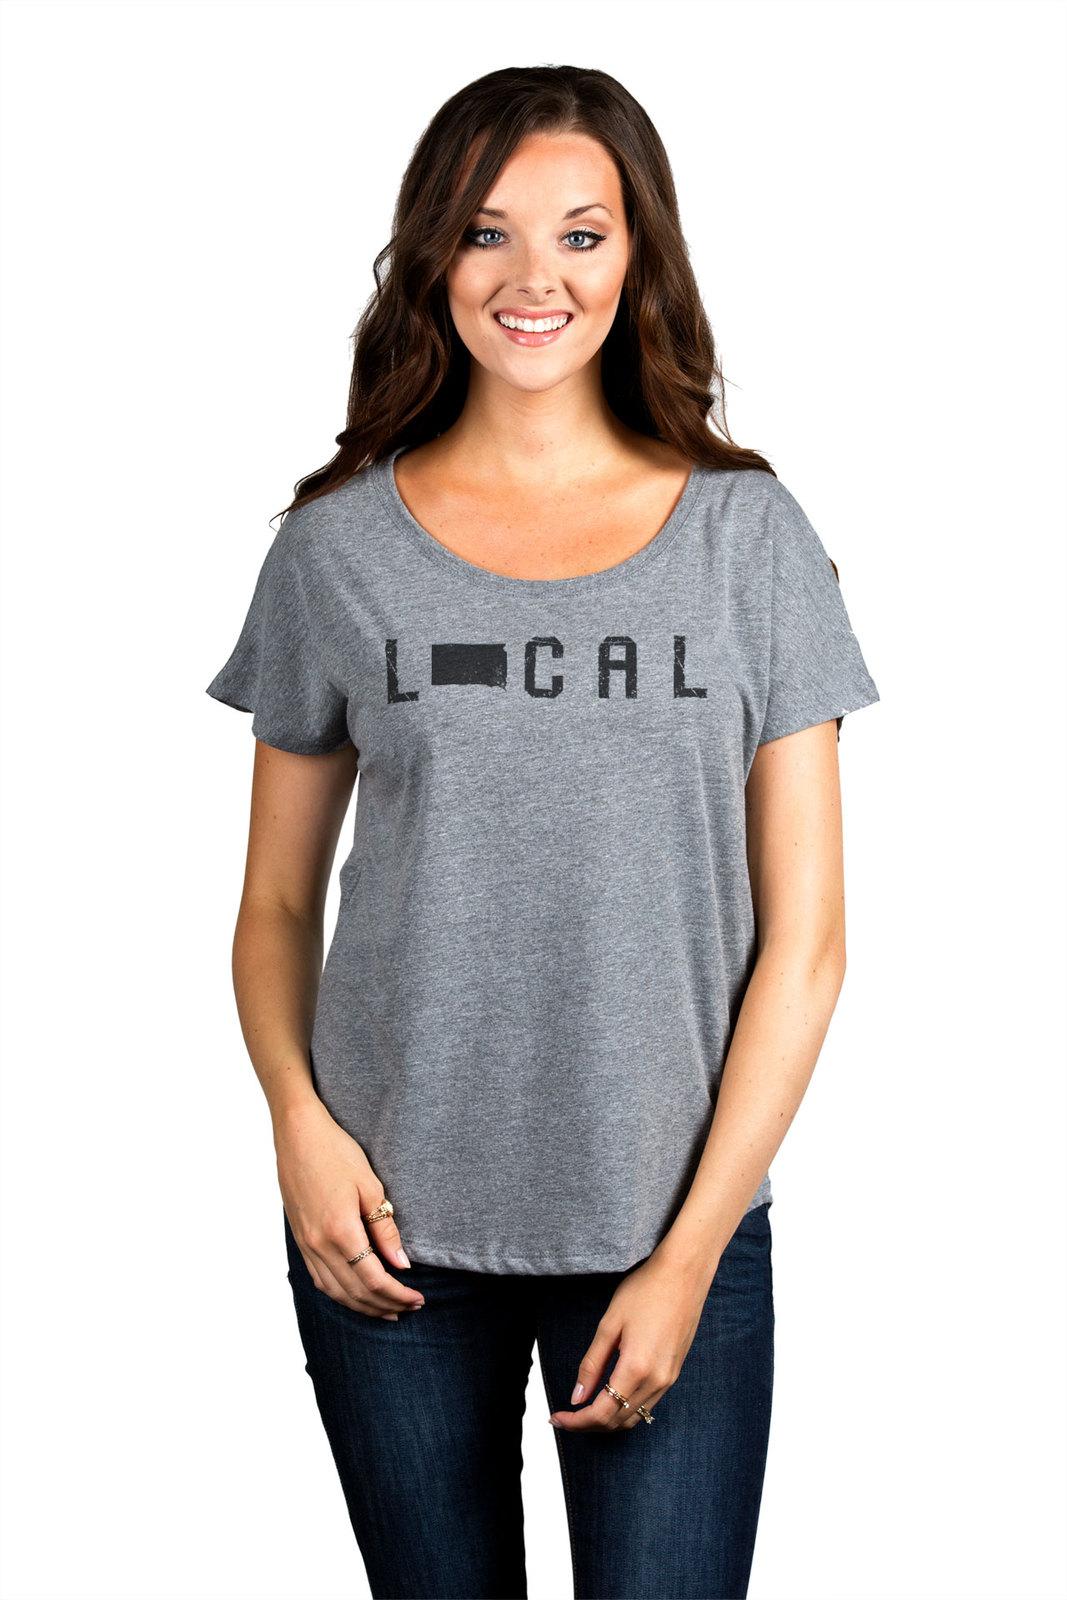 Thread Tank Local South Dakota State Women's Slouchy Dolman T-Shirt Tee Heather